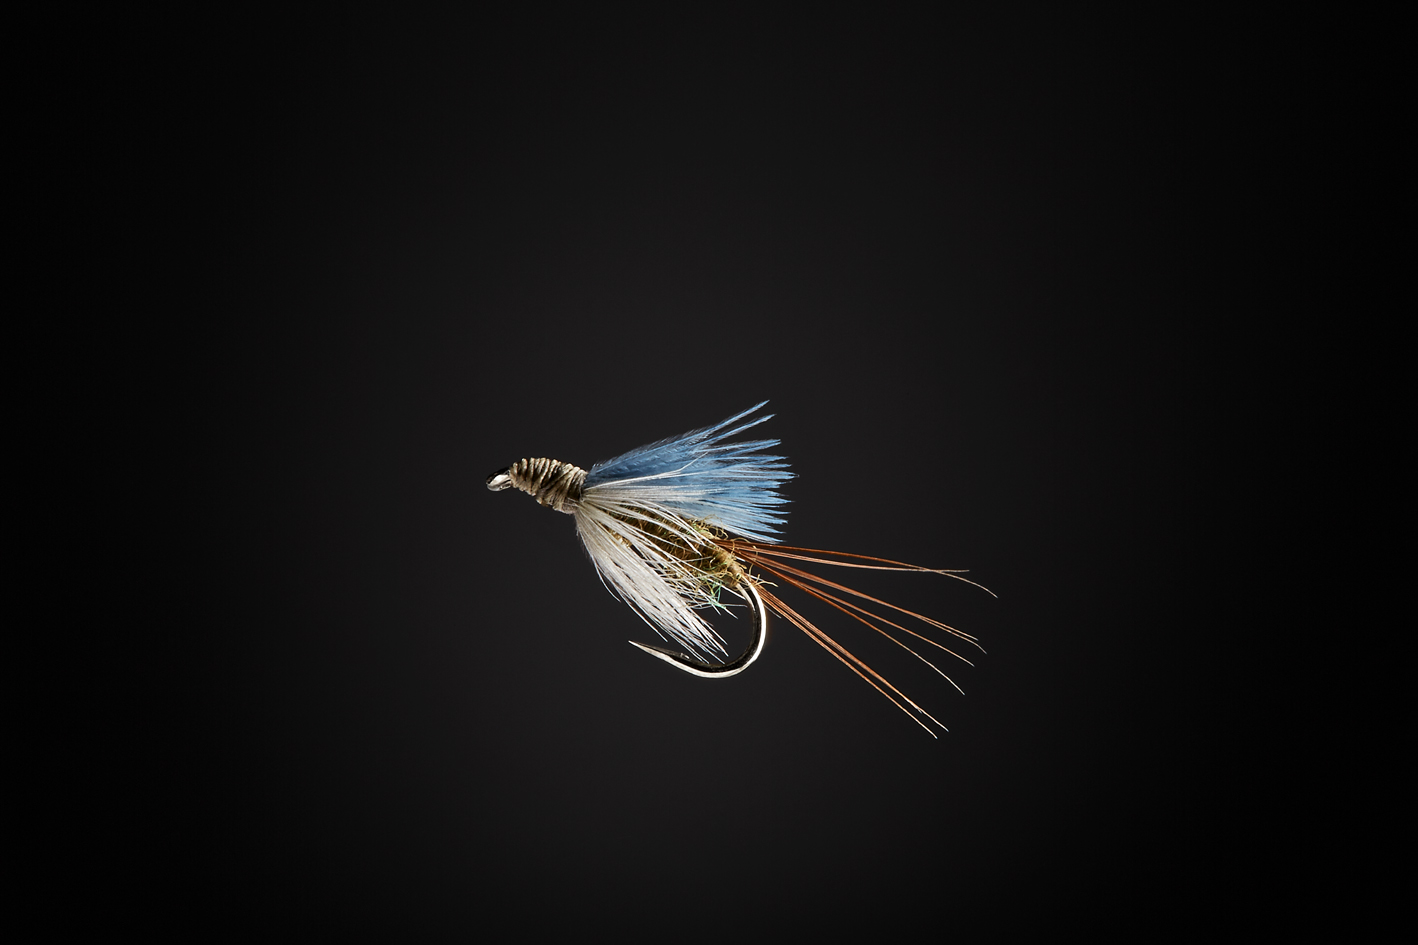 Flys_074.jpg